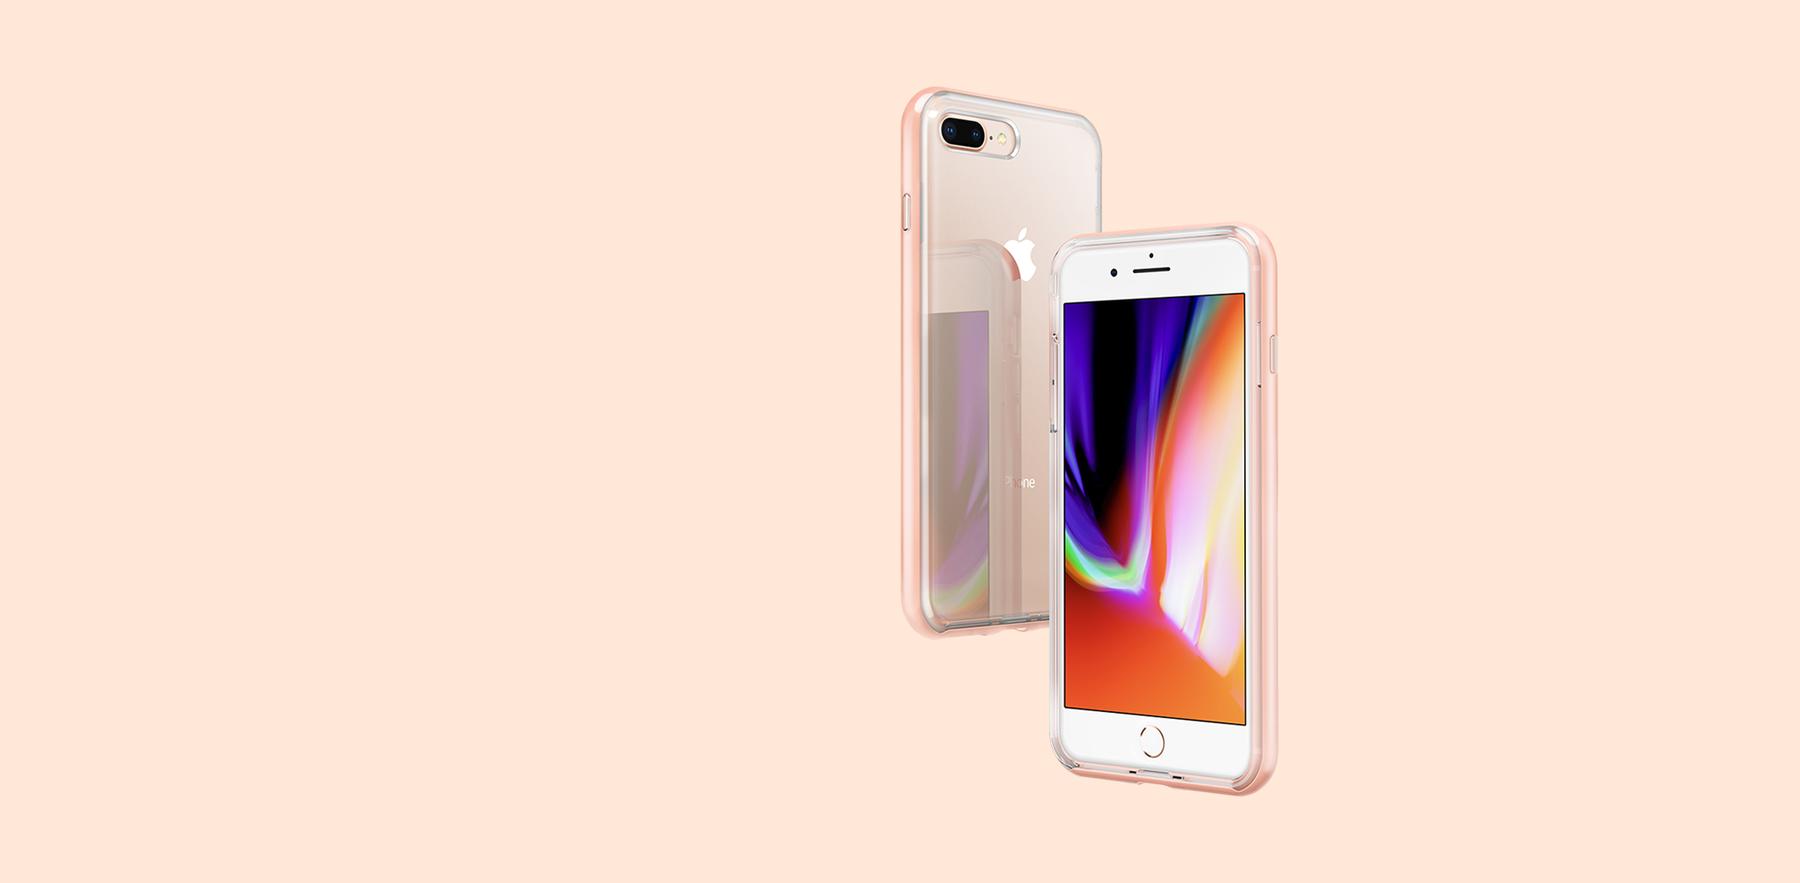 iPhone 8 - iPhone 8 Plus - iPhone X - SATIŞTA